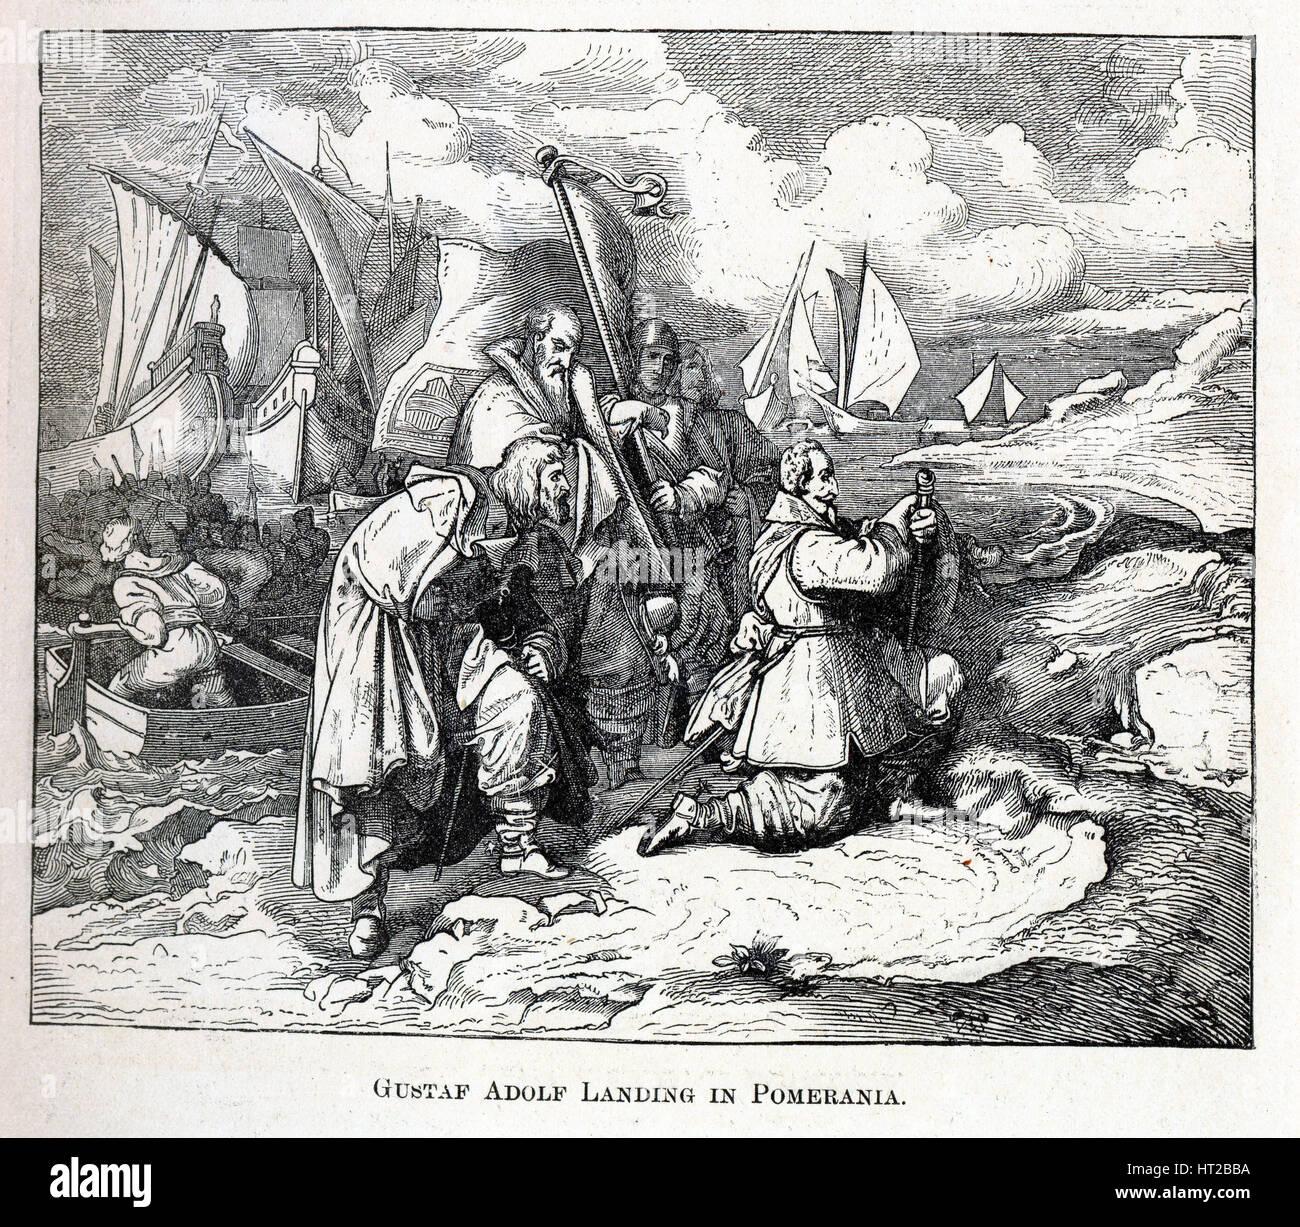 Gustav Adolf Landing in Pomerania, 1882. Artist: Anonymous - Stock Image